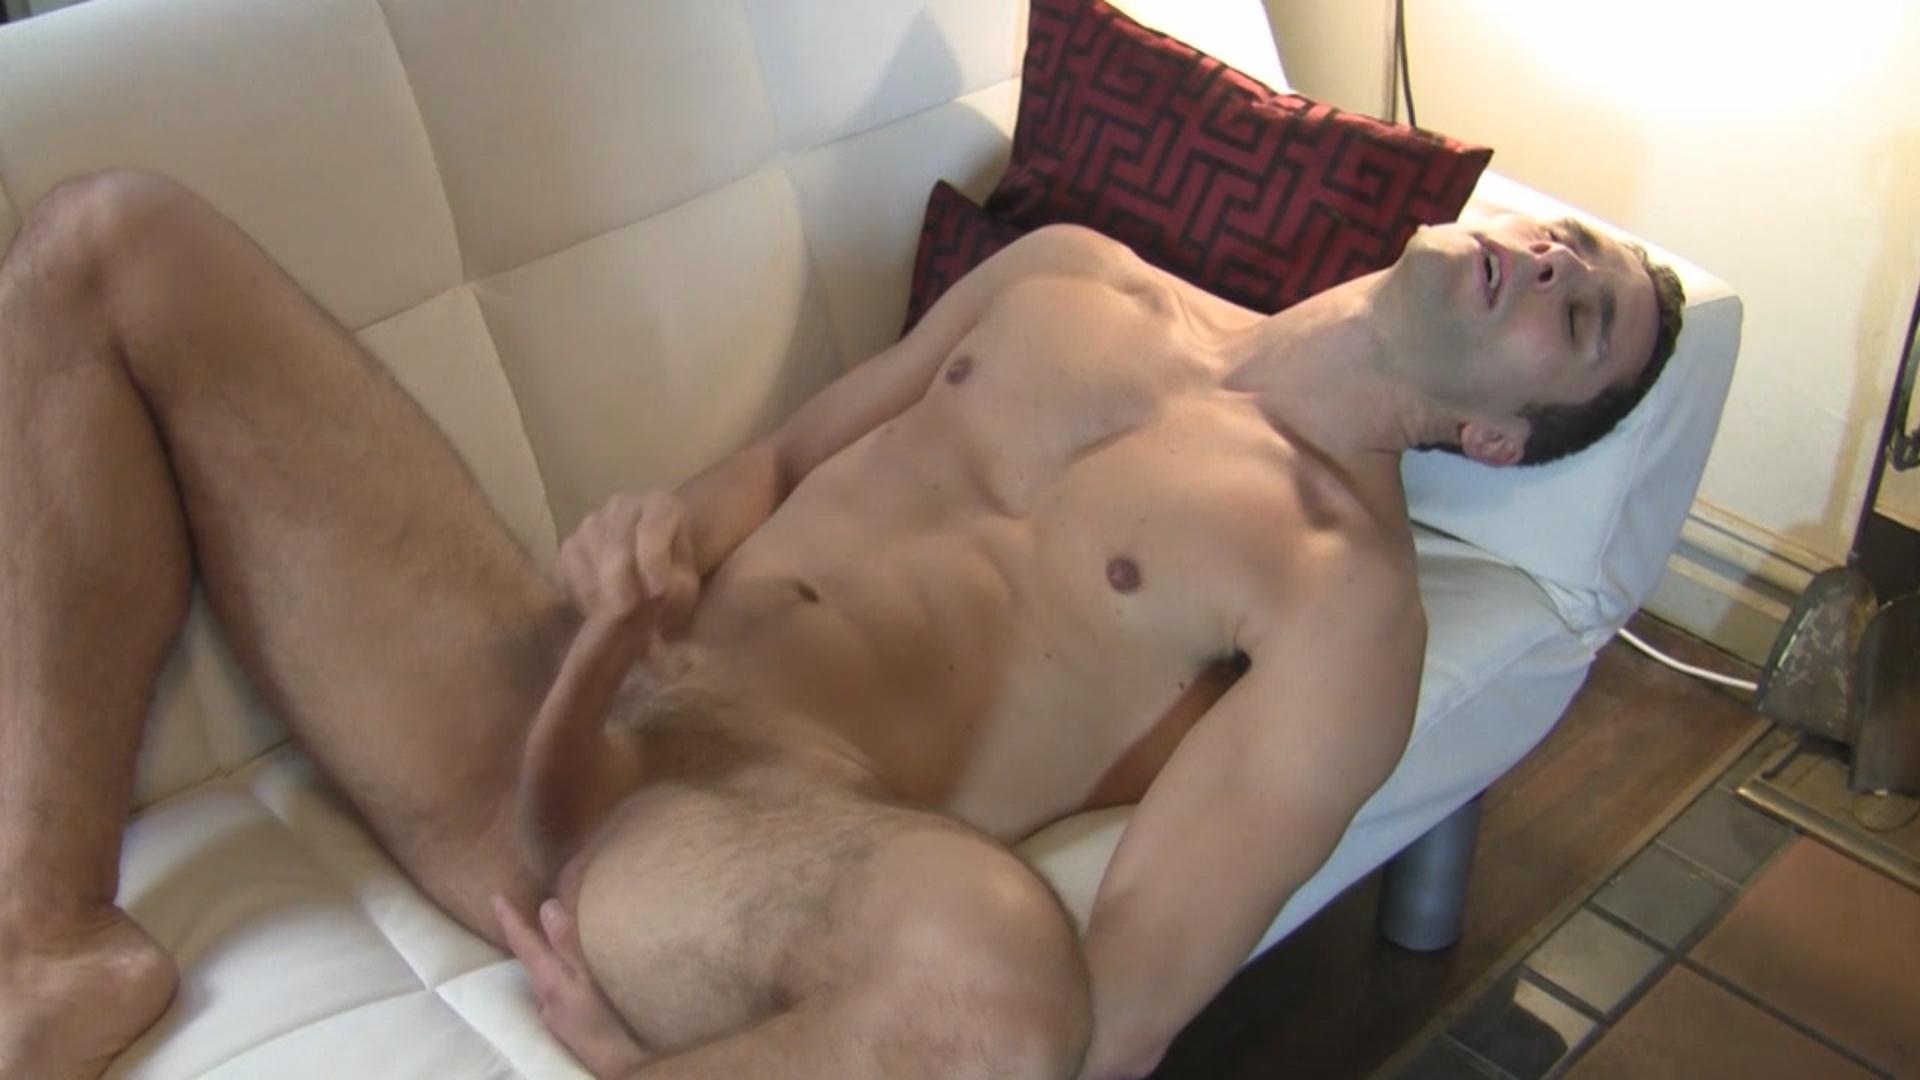 Down Under Aussie Personal Trainer Xvideo gay